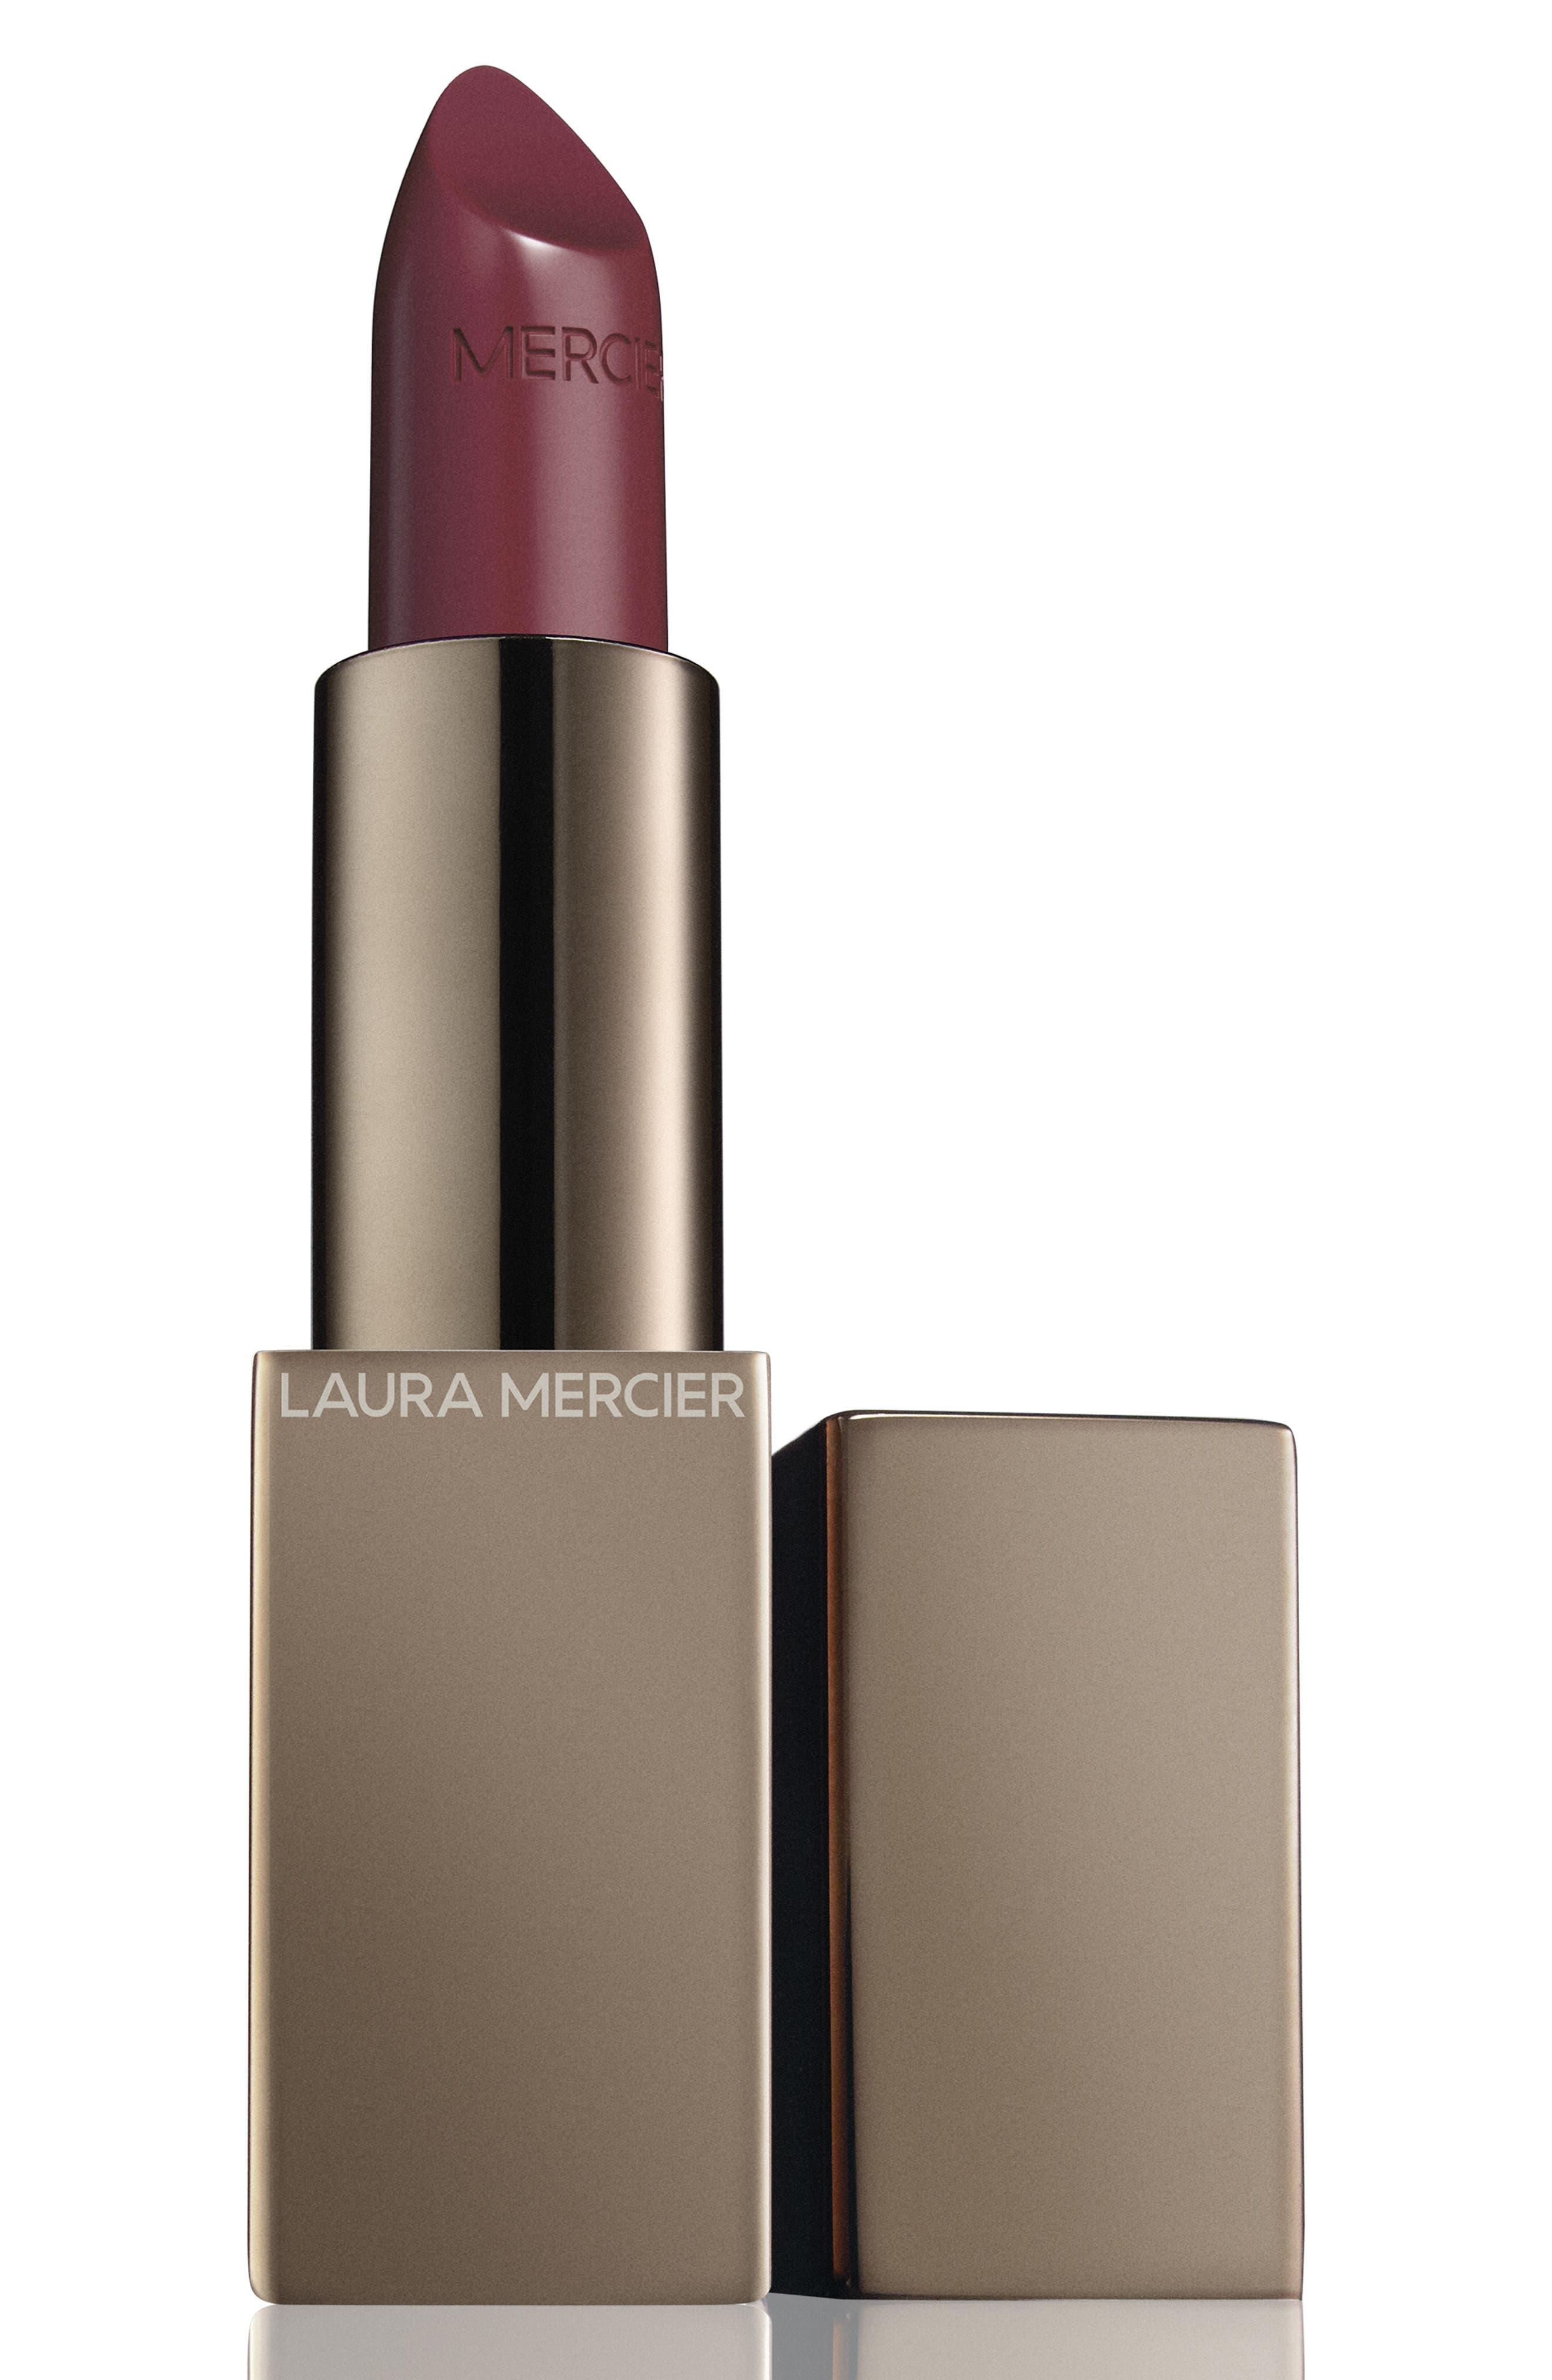 Image of Laura Mercier Rouge Essentiel Silky Creme Lipstick - Mauve Plum